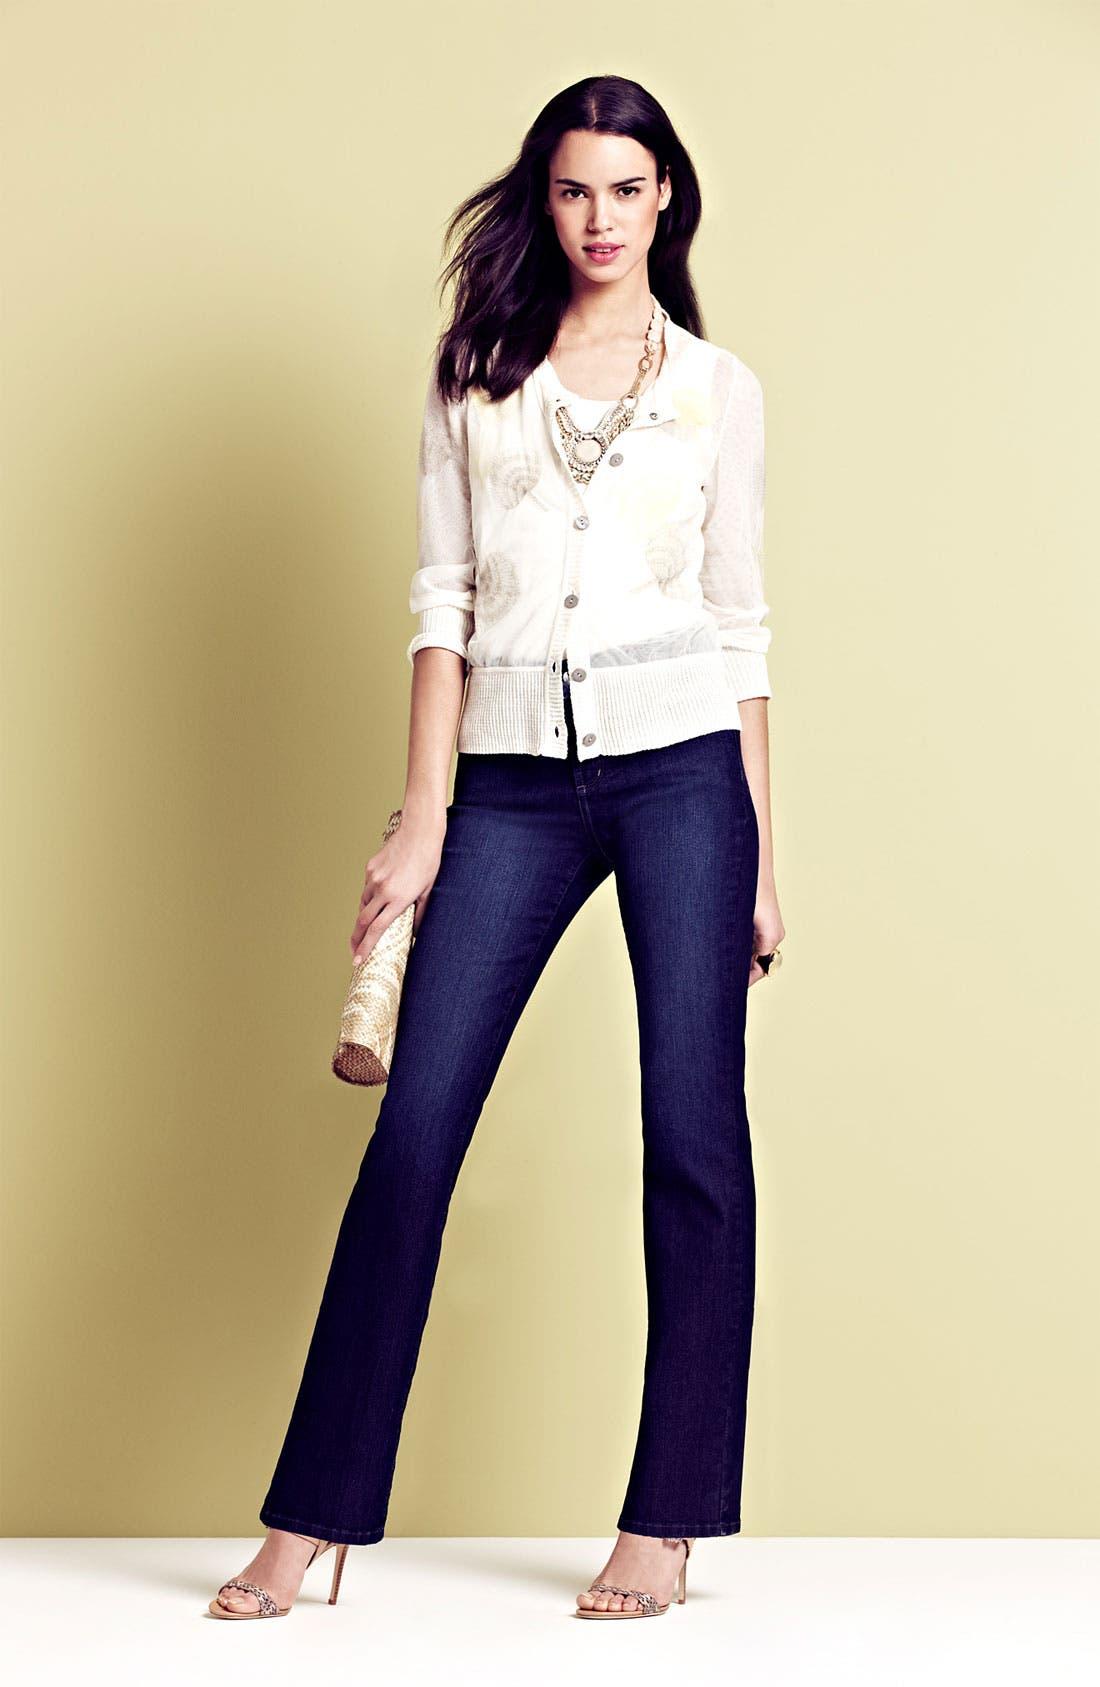 Main Image - NYDJ 'Barbara' Jeans, Nic + Zoe Cardigan & Tank